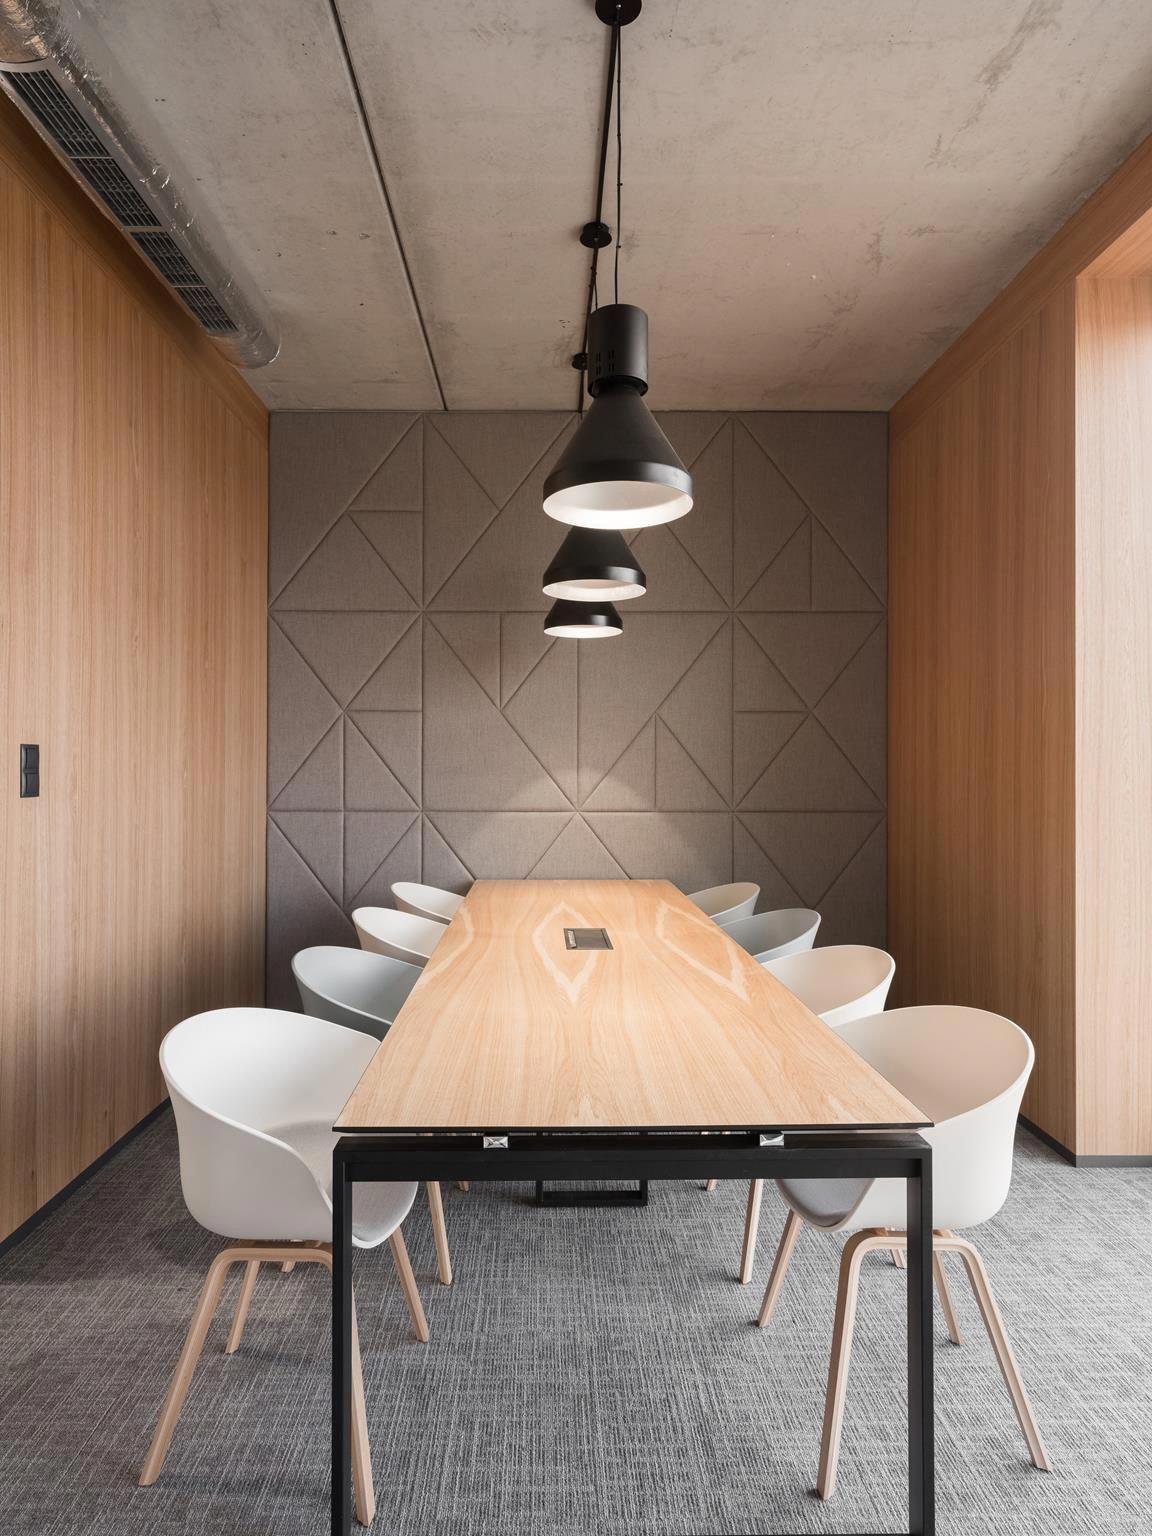 Office Designs Northbrook Officedesigns Modern Office Design Office Layout Office Interior Design